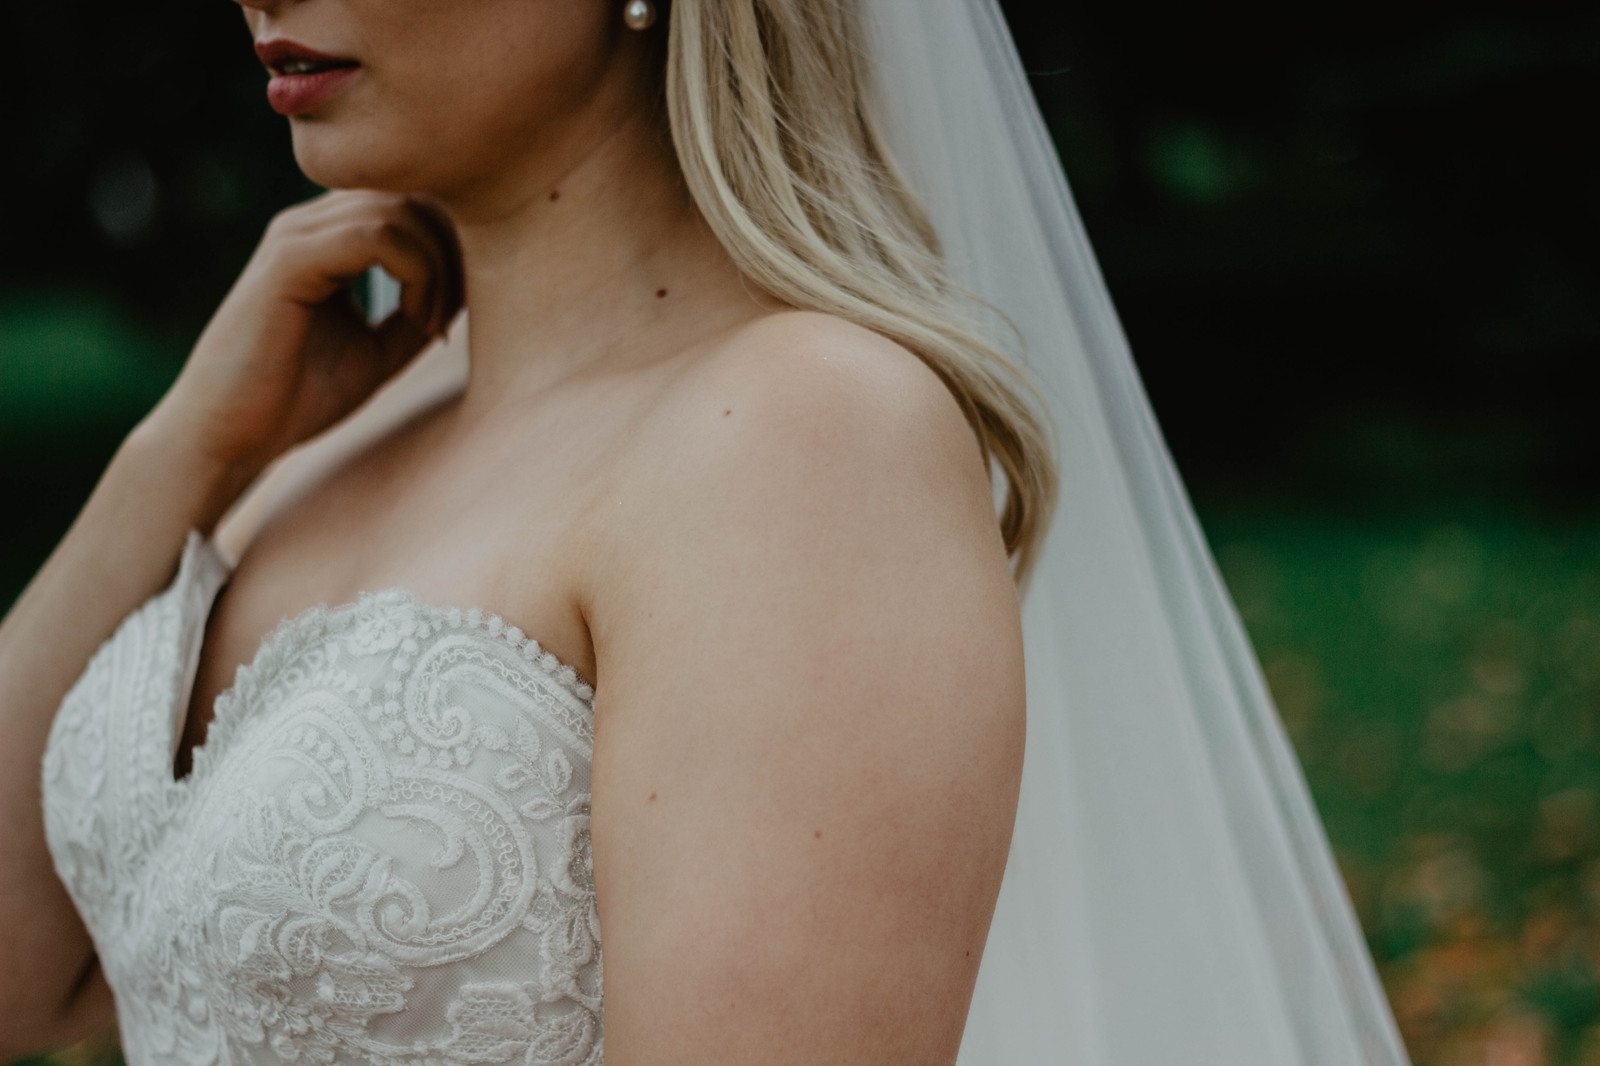 Uk Cardiff Birth Wedding Lifestyle Photographer Hannah B